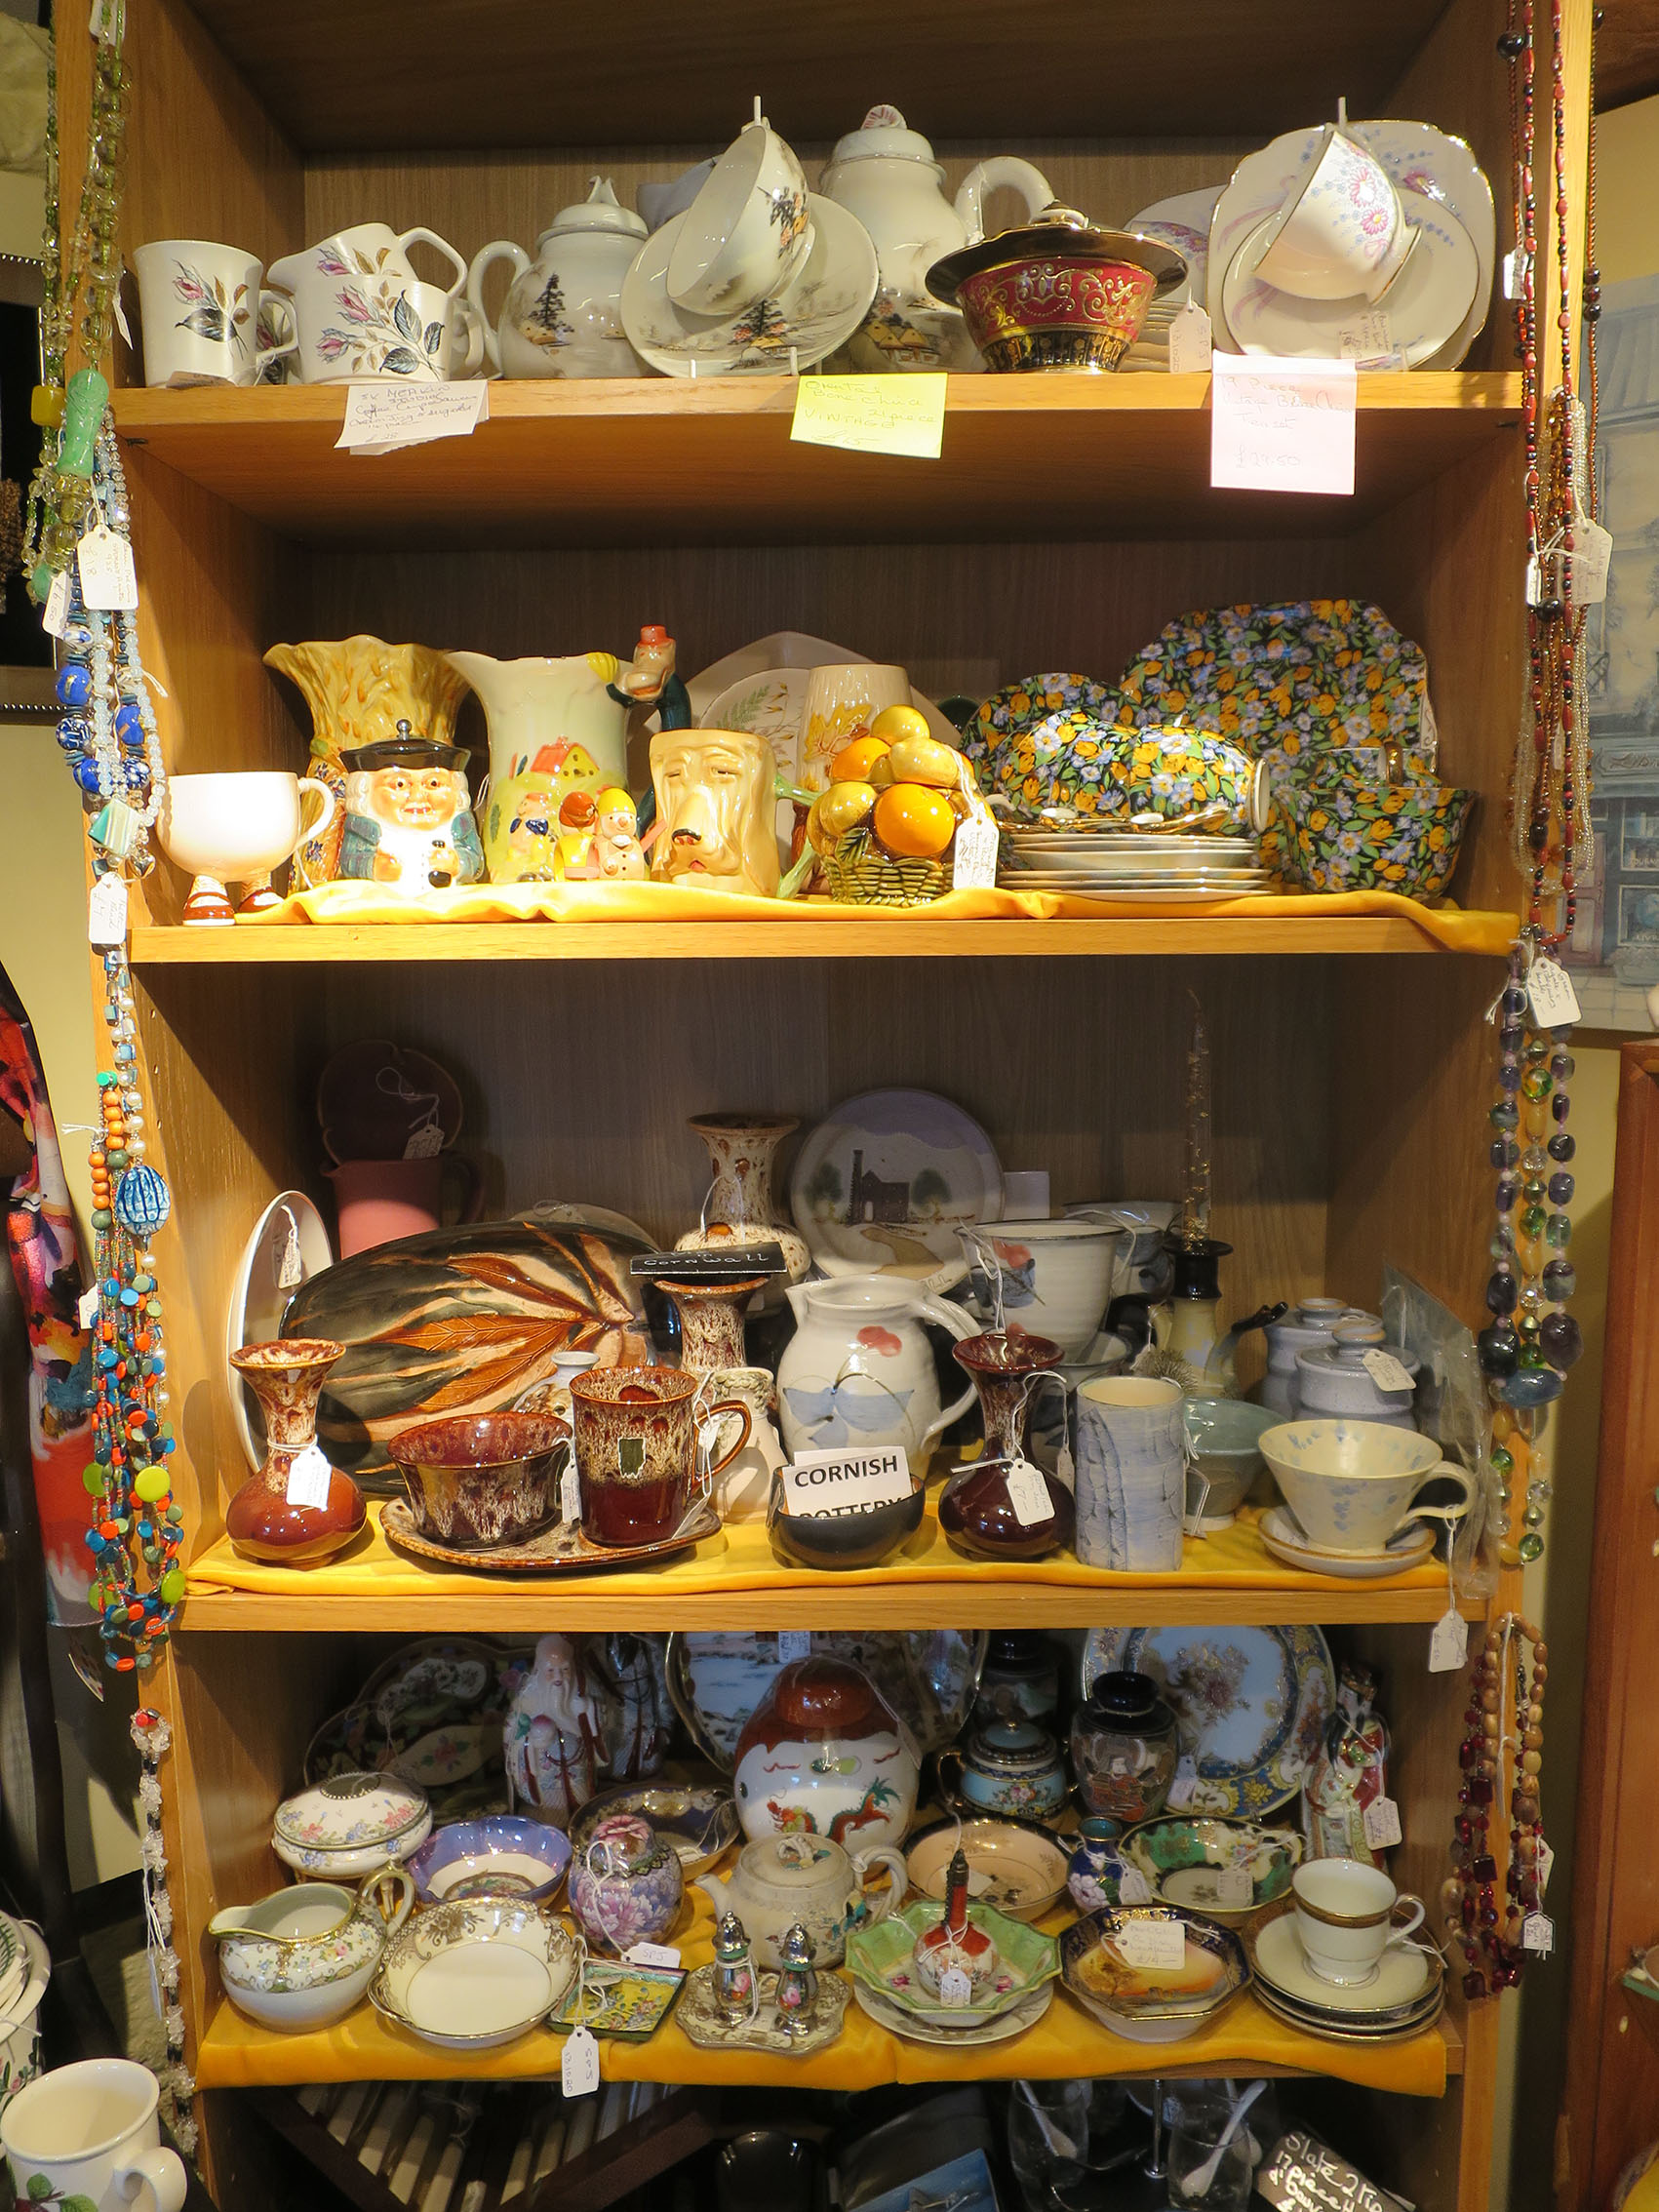 Cornish_Pottery